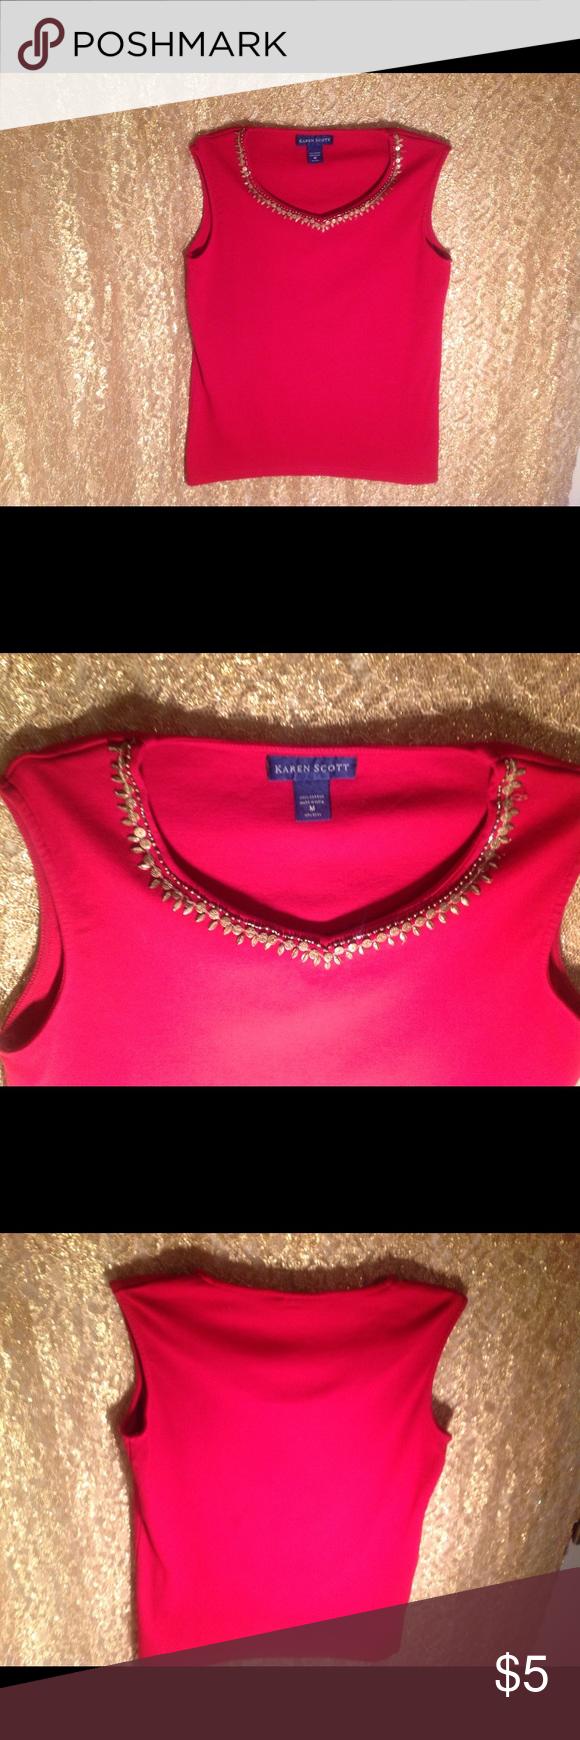 Karen Scott Embellished Beads Sleeveless Top 100 % Cotton * Size Medium * Color Red * Pullover Top * Karen Scott Tops Blouses